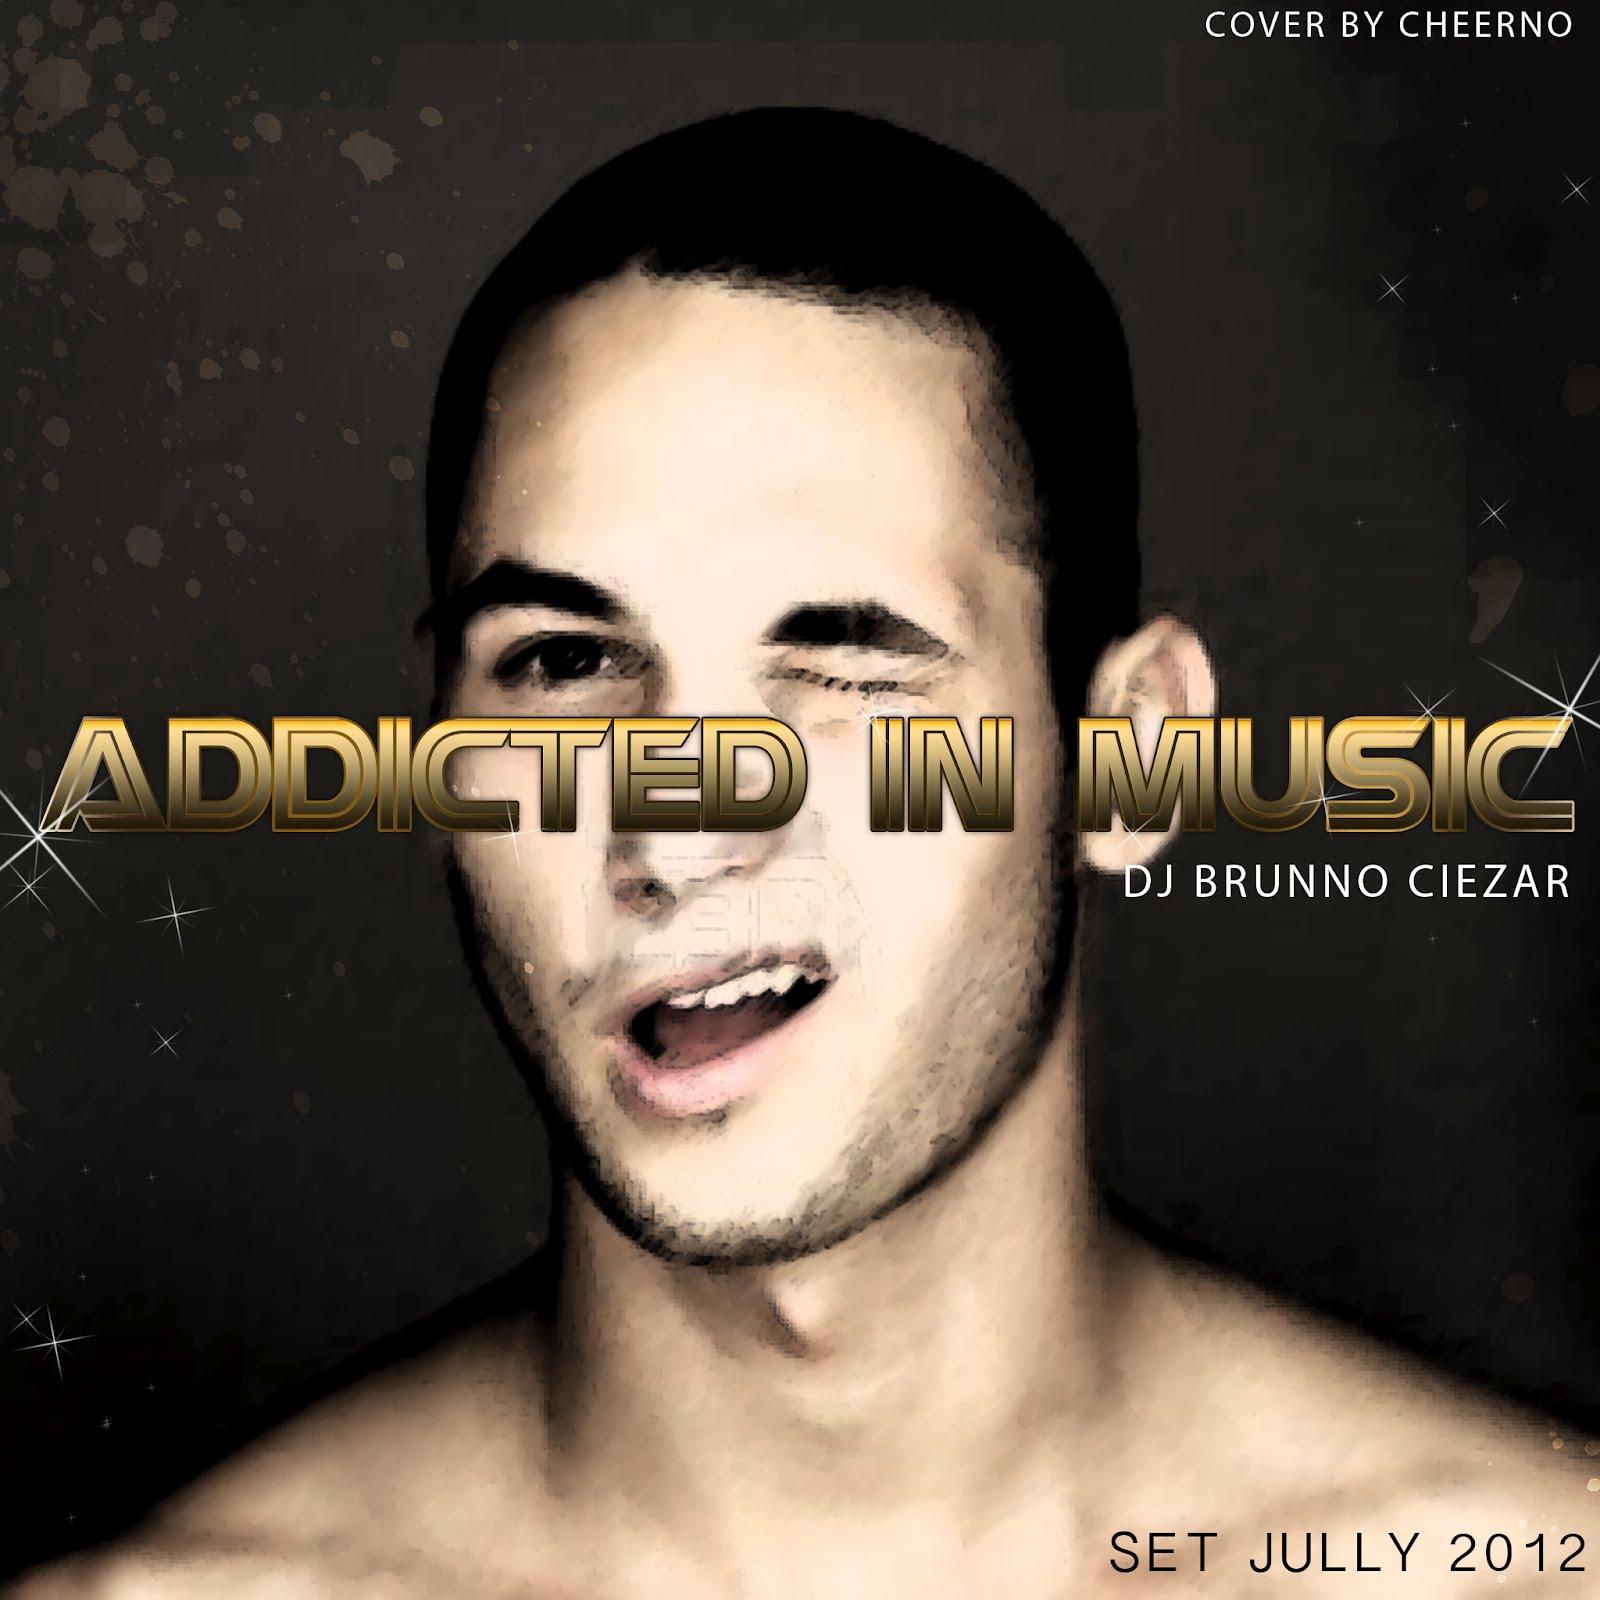 DJ Brunno Ciezar - ADDICTED IN MUSIC